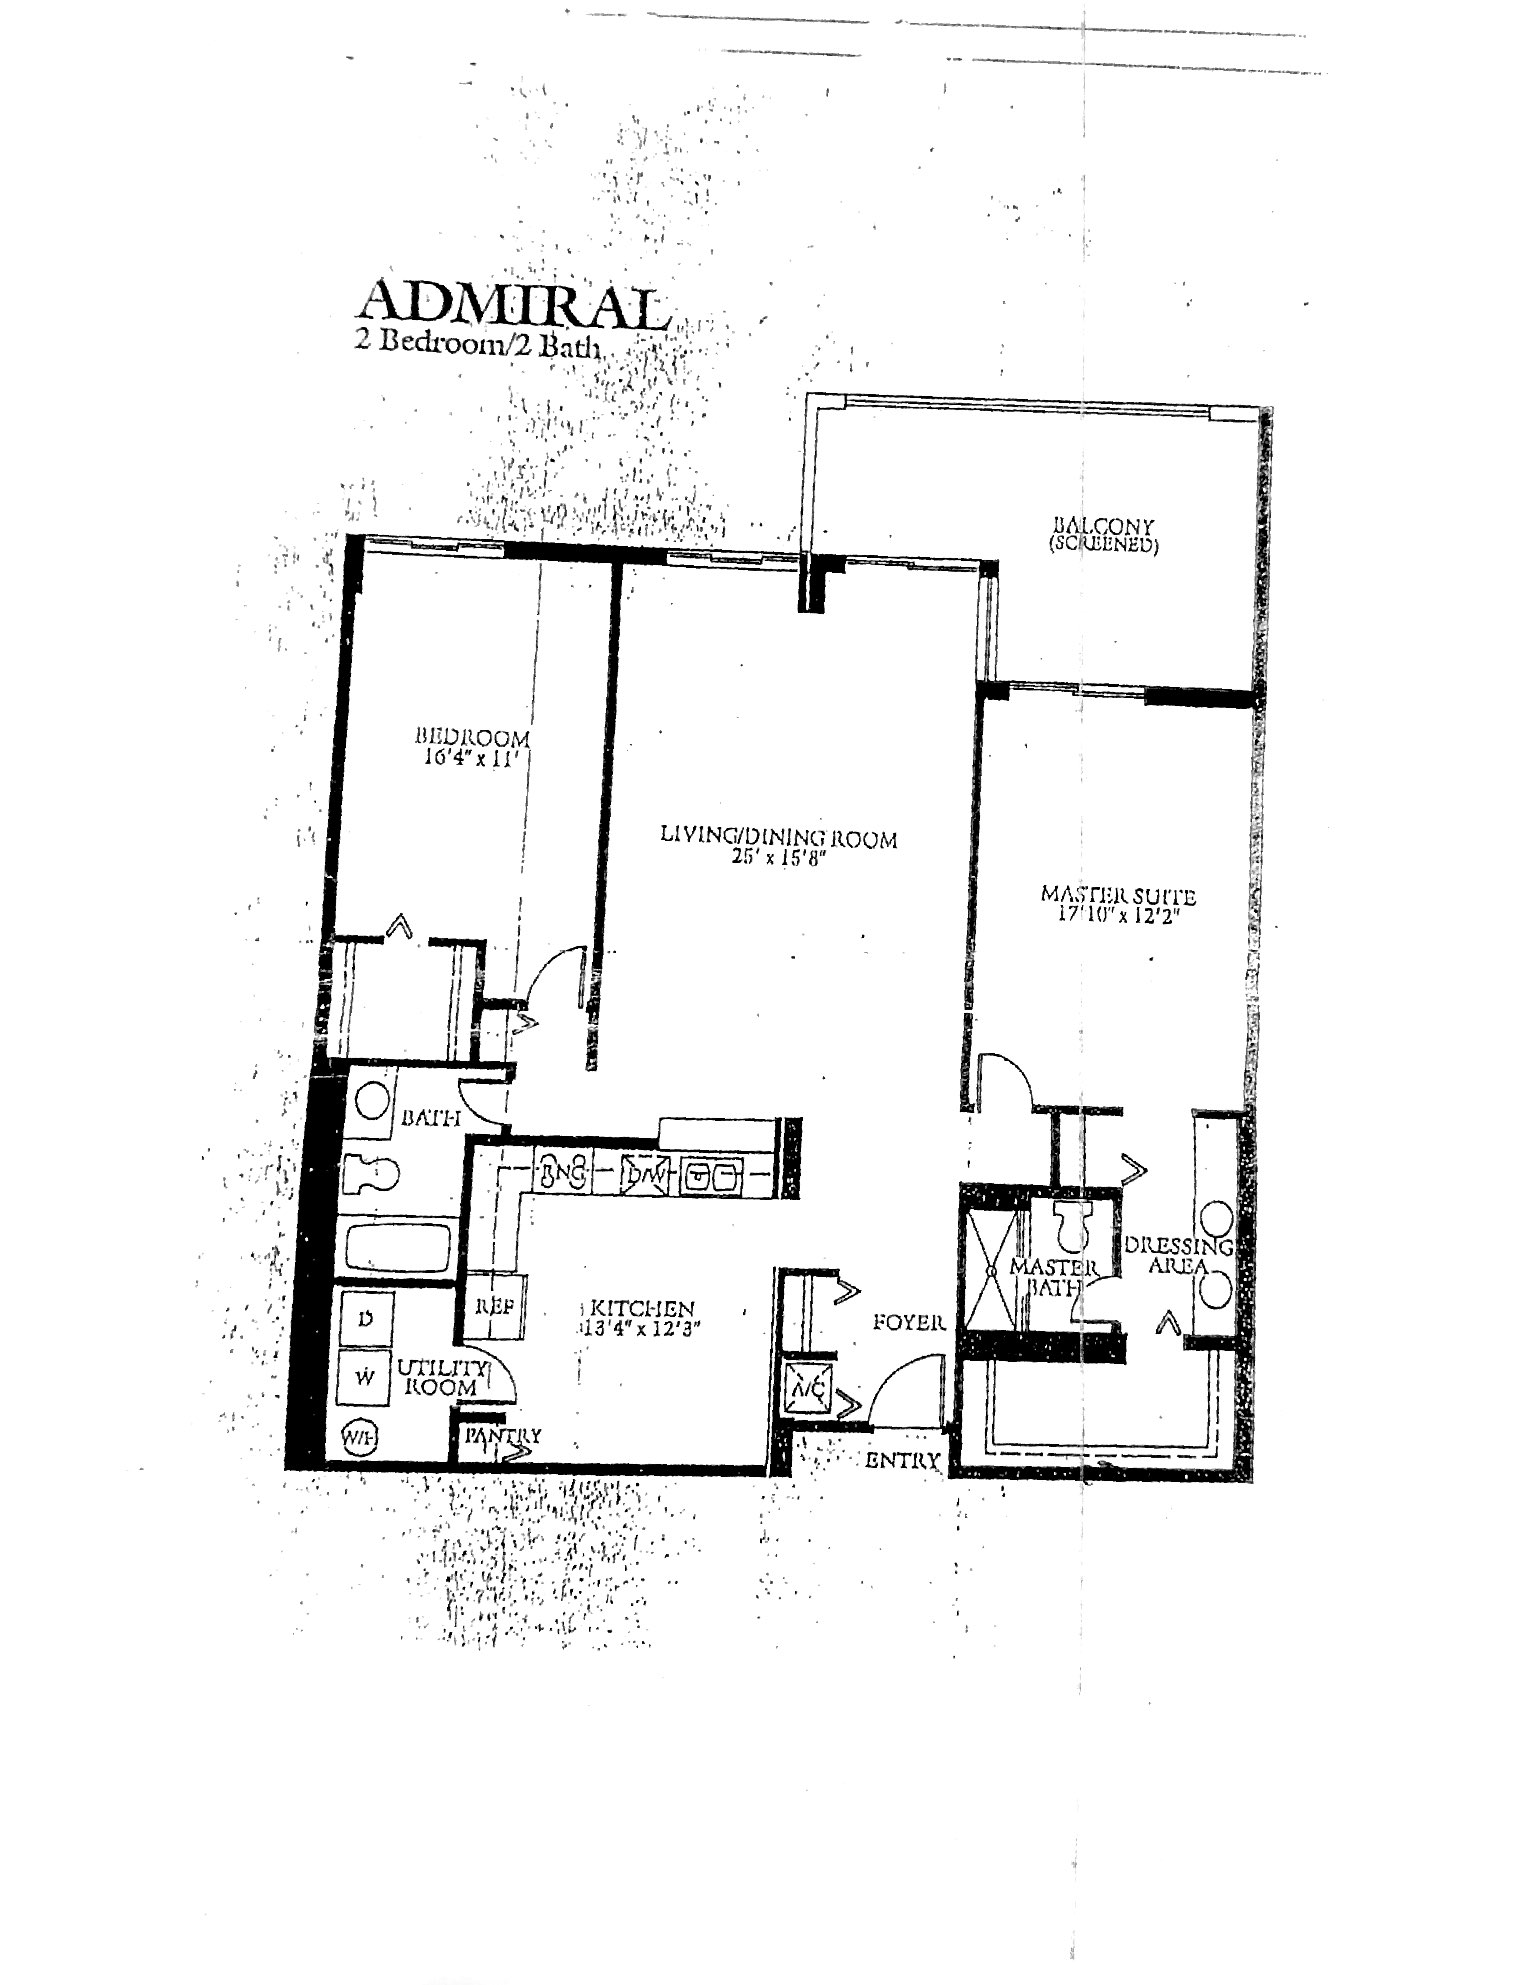 Coronado's Admiral Floor Plan